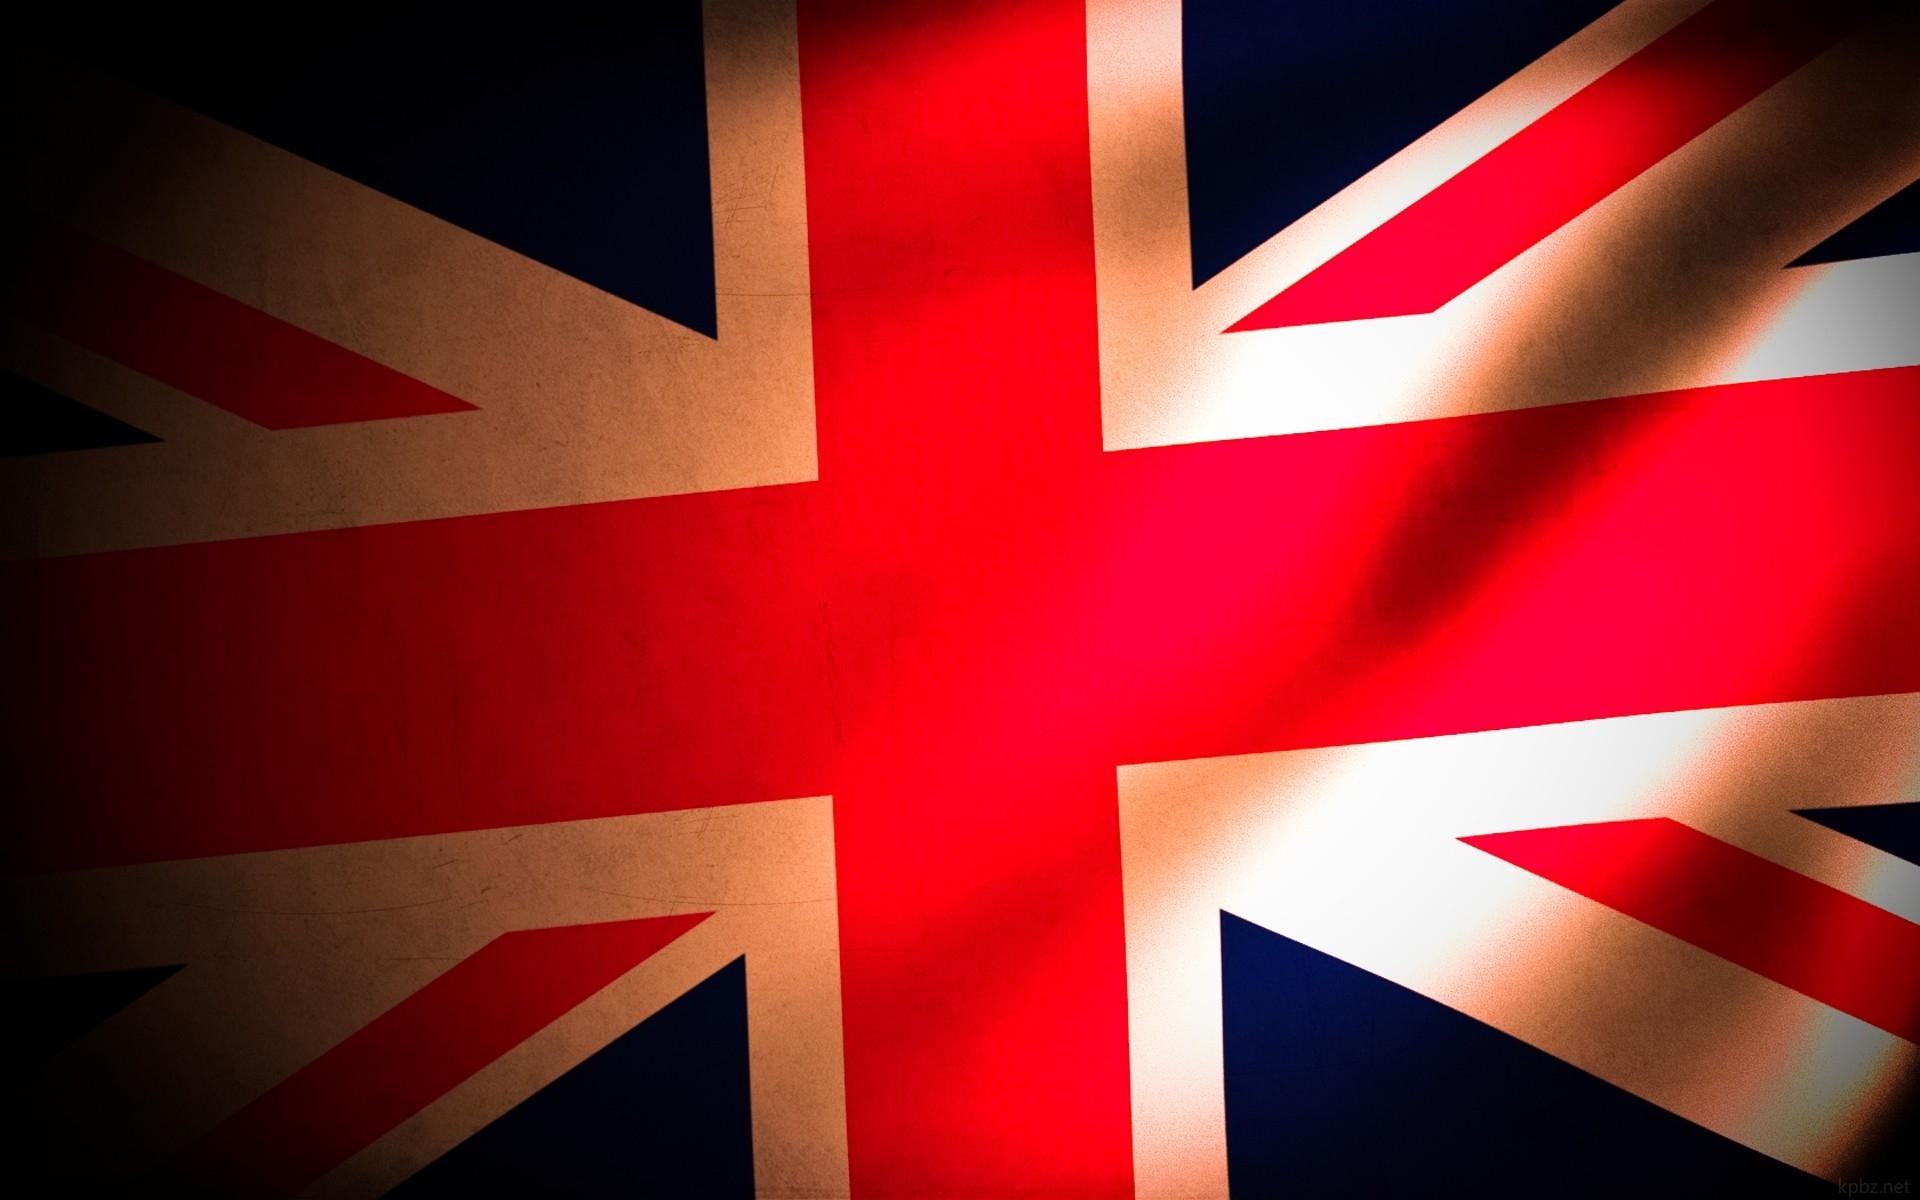 36827 Заставки и Обои Флаги на телефон. Скачать Фон, Флаги картинки бесплатно